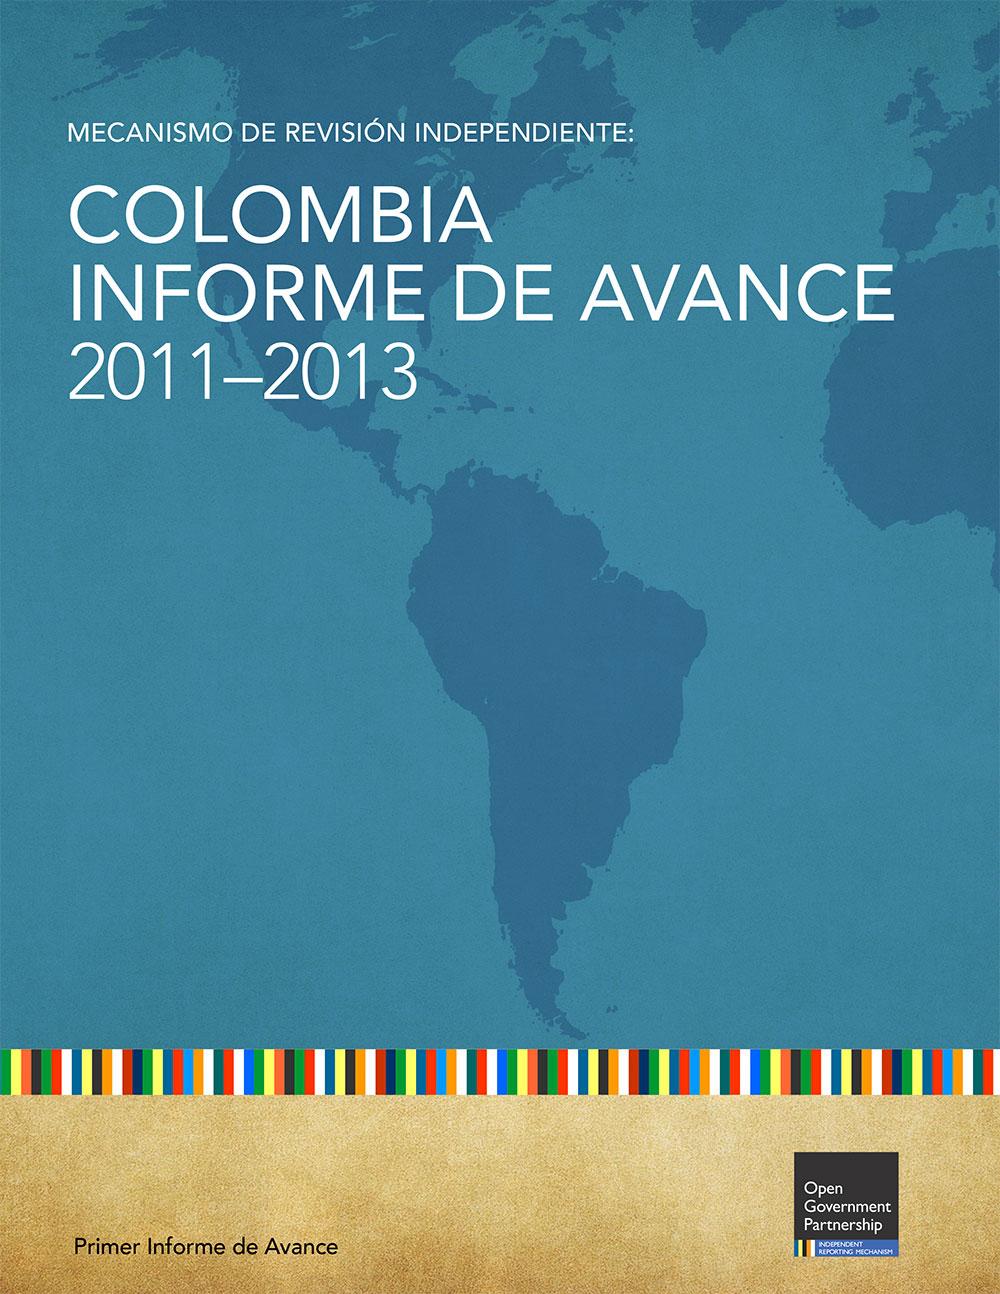 Mecanismo de Revisión Independiente: ColombiaInforme de Avance 2011 – 2013